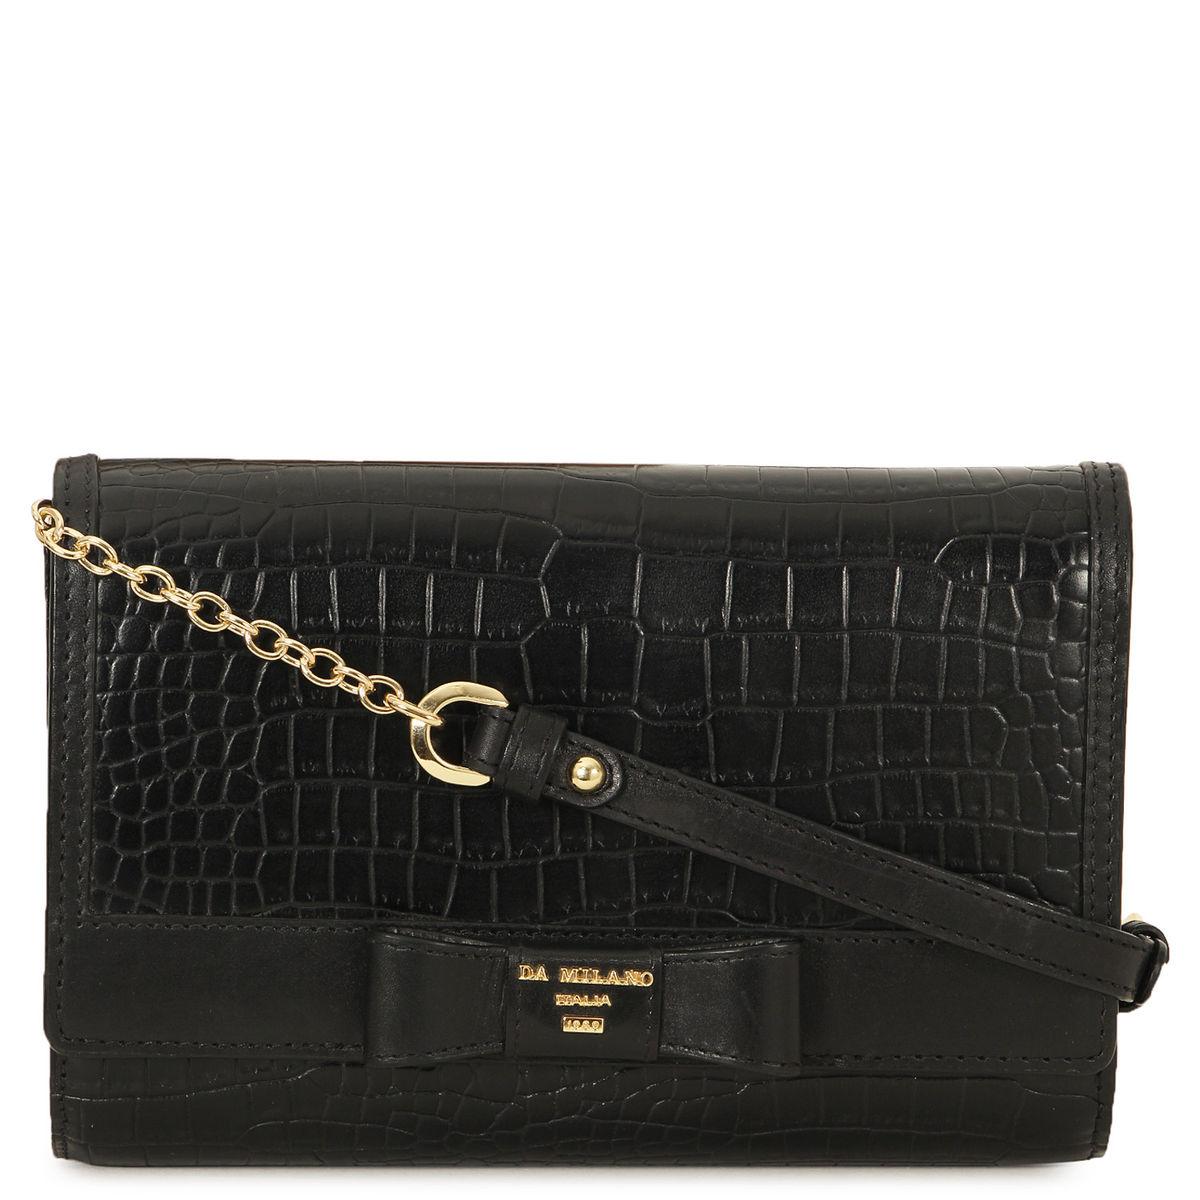 746ddb91027b Branded Black Sling Bags